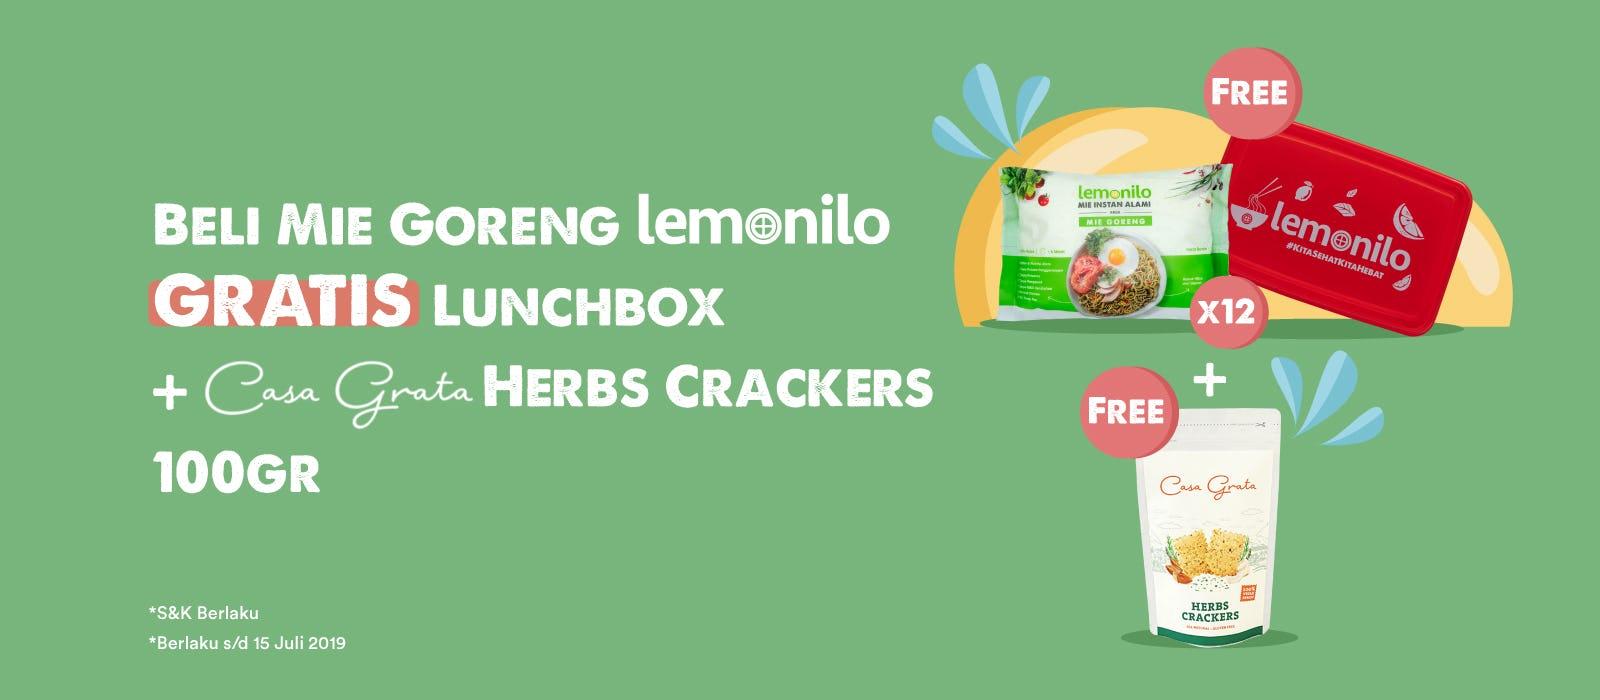 Beli Mie Goreng Lemonilo GRATIS Lunchbox dan Casa Grata Herbs Crackers